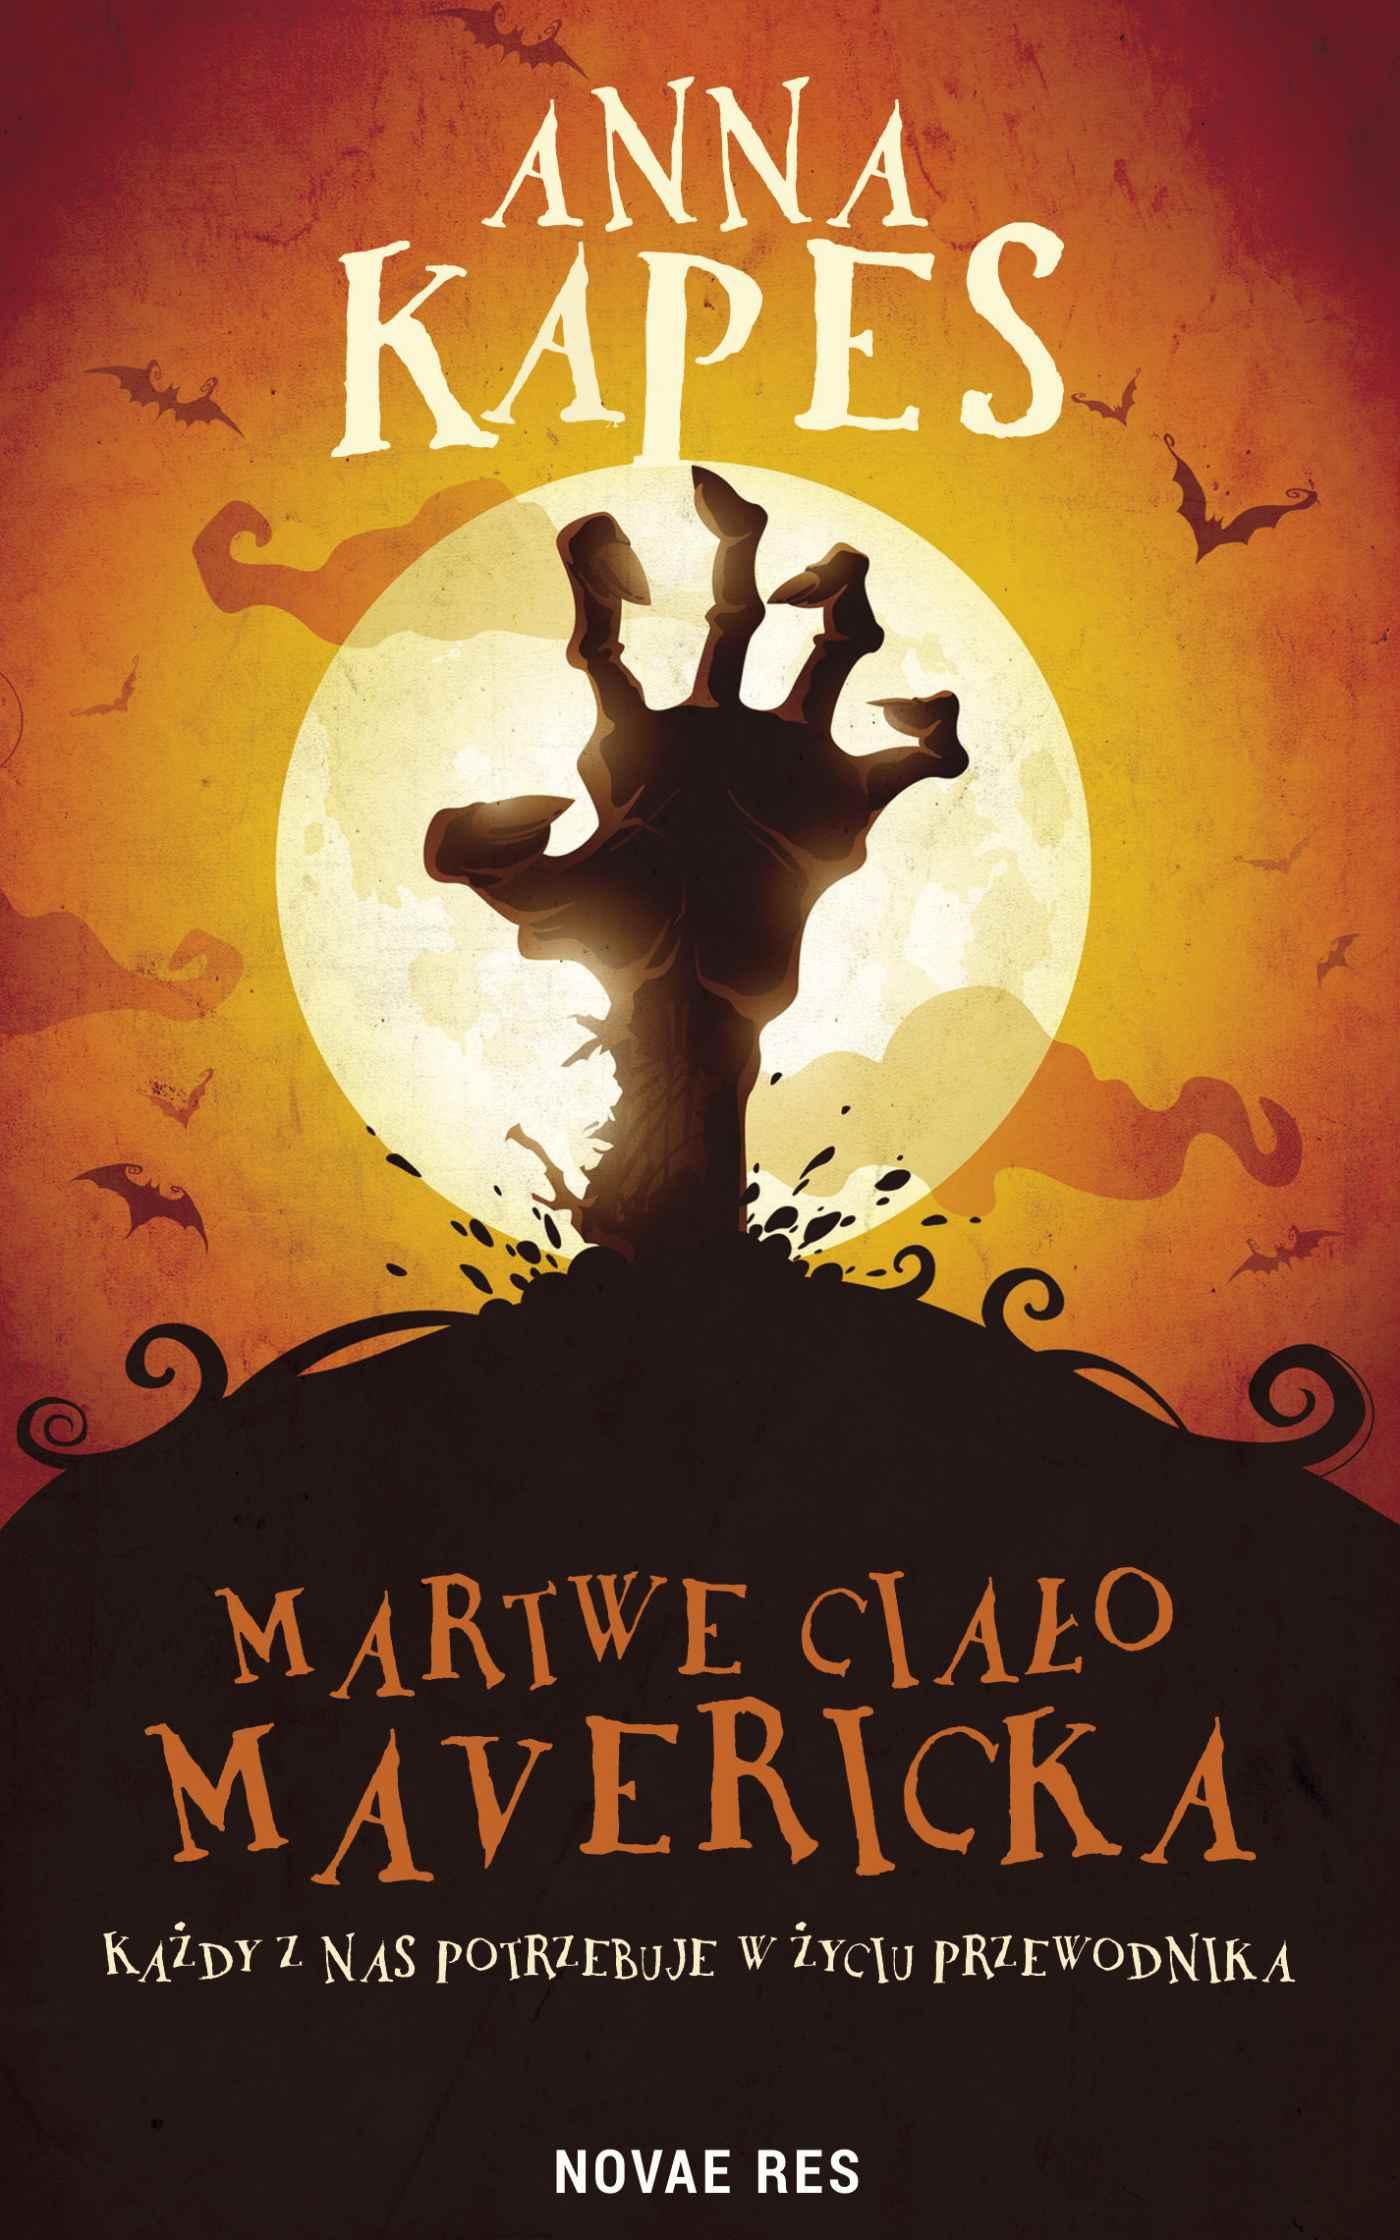 Martwe ciało Mavericka - Ebook (Książka EPUB) do pobrania w formacie EPUB